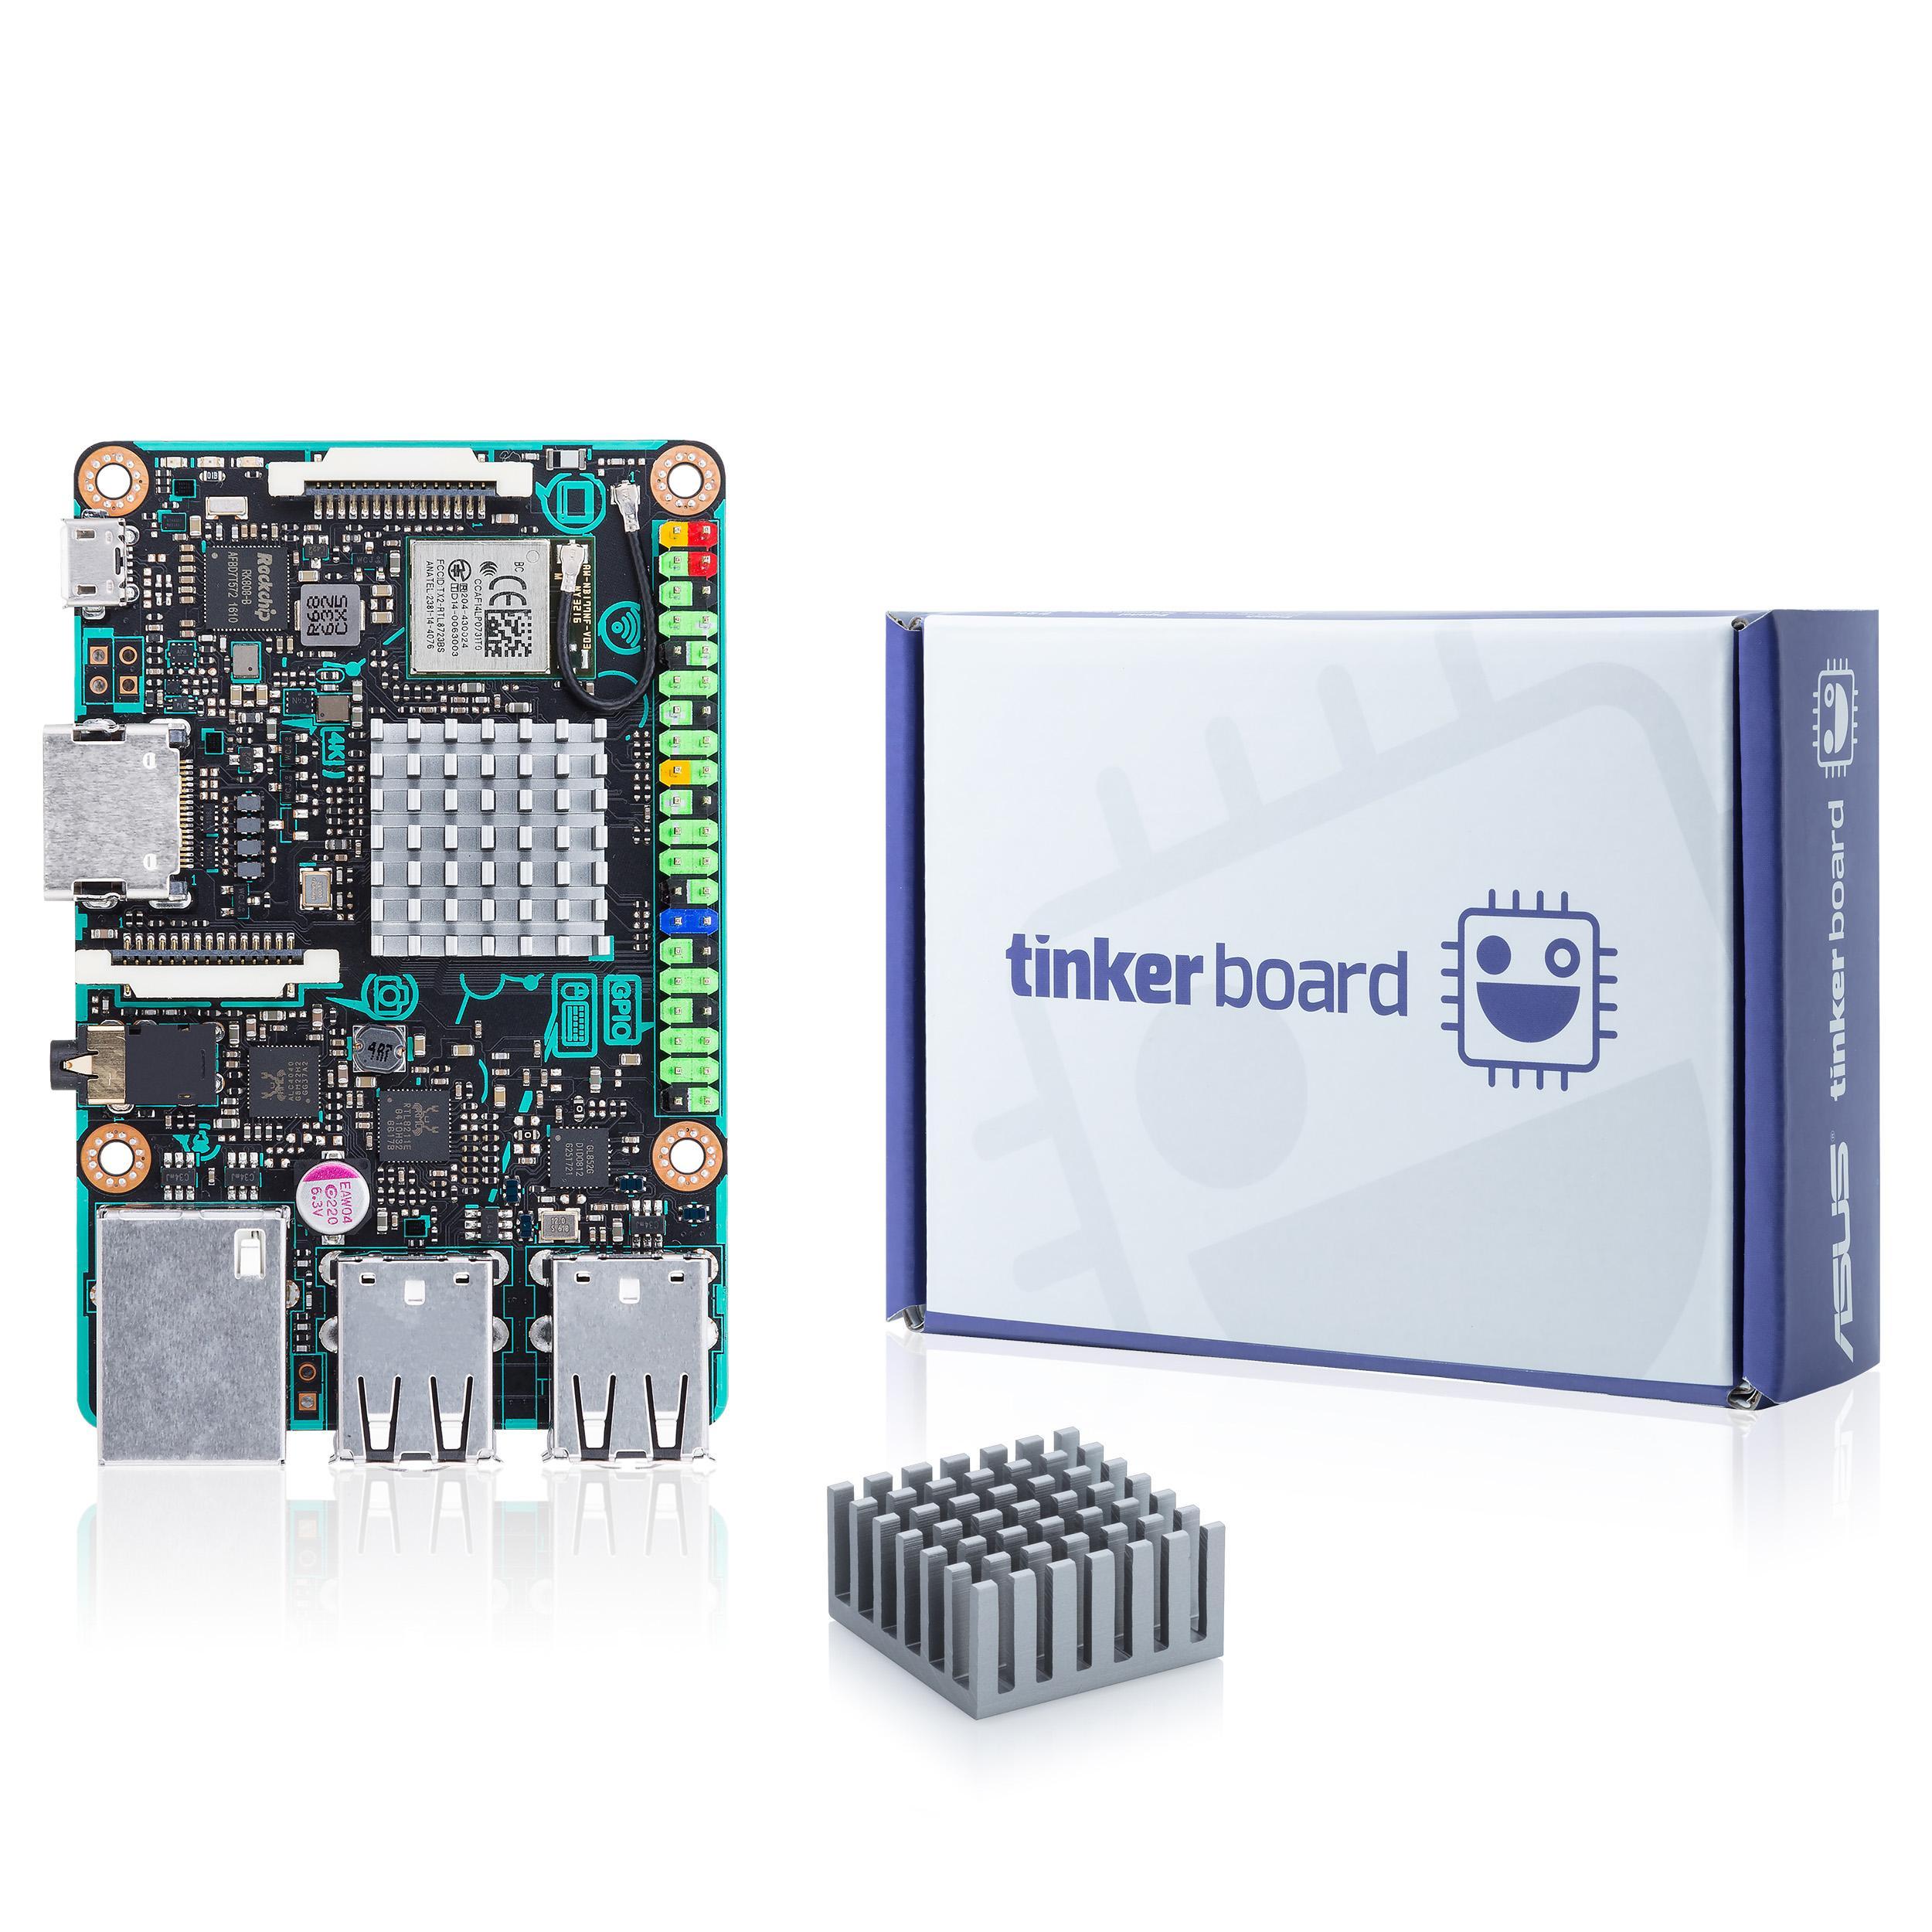 ASUS SBC Tinker Board RK3288 SoC 1 8GHz Quad Core CPU